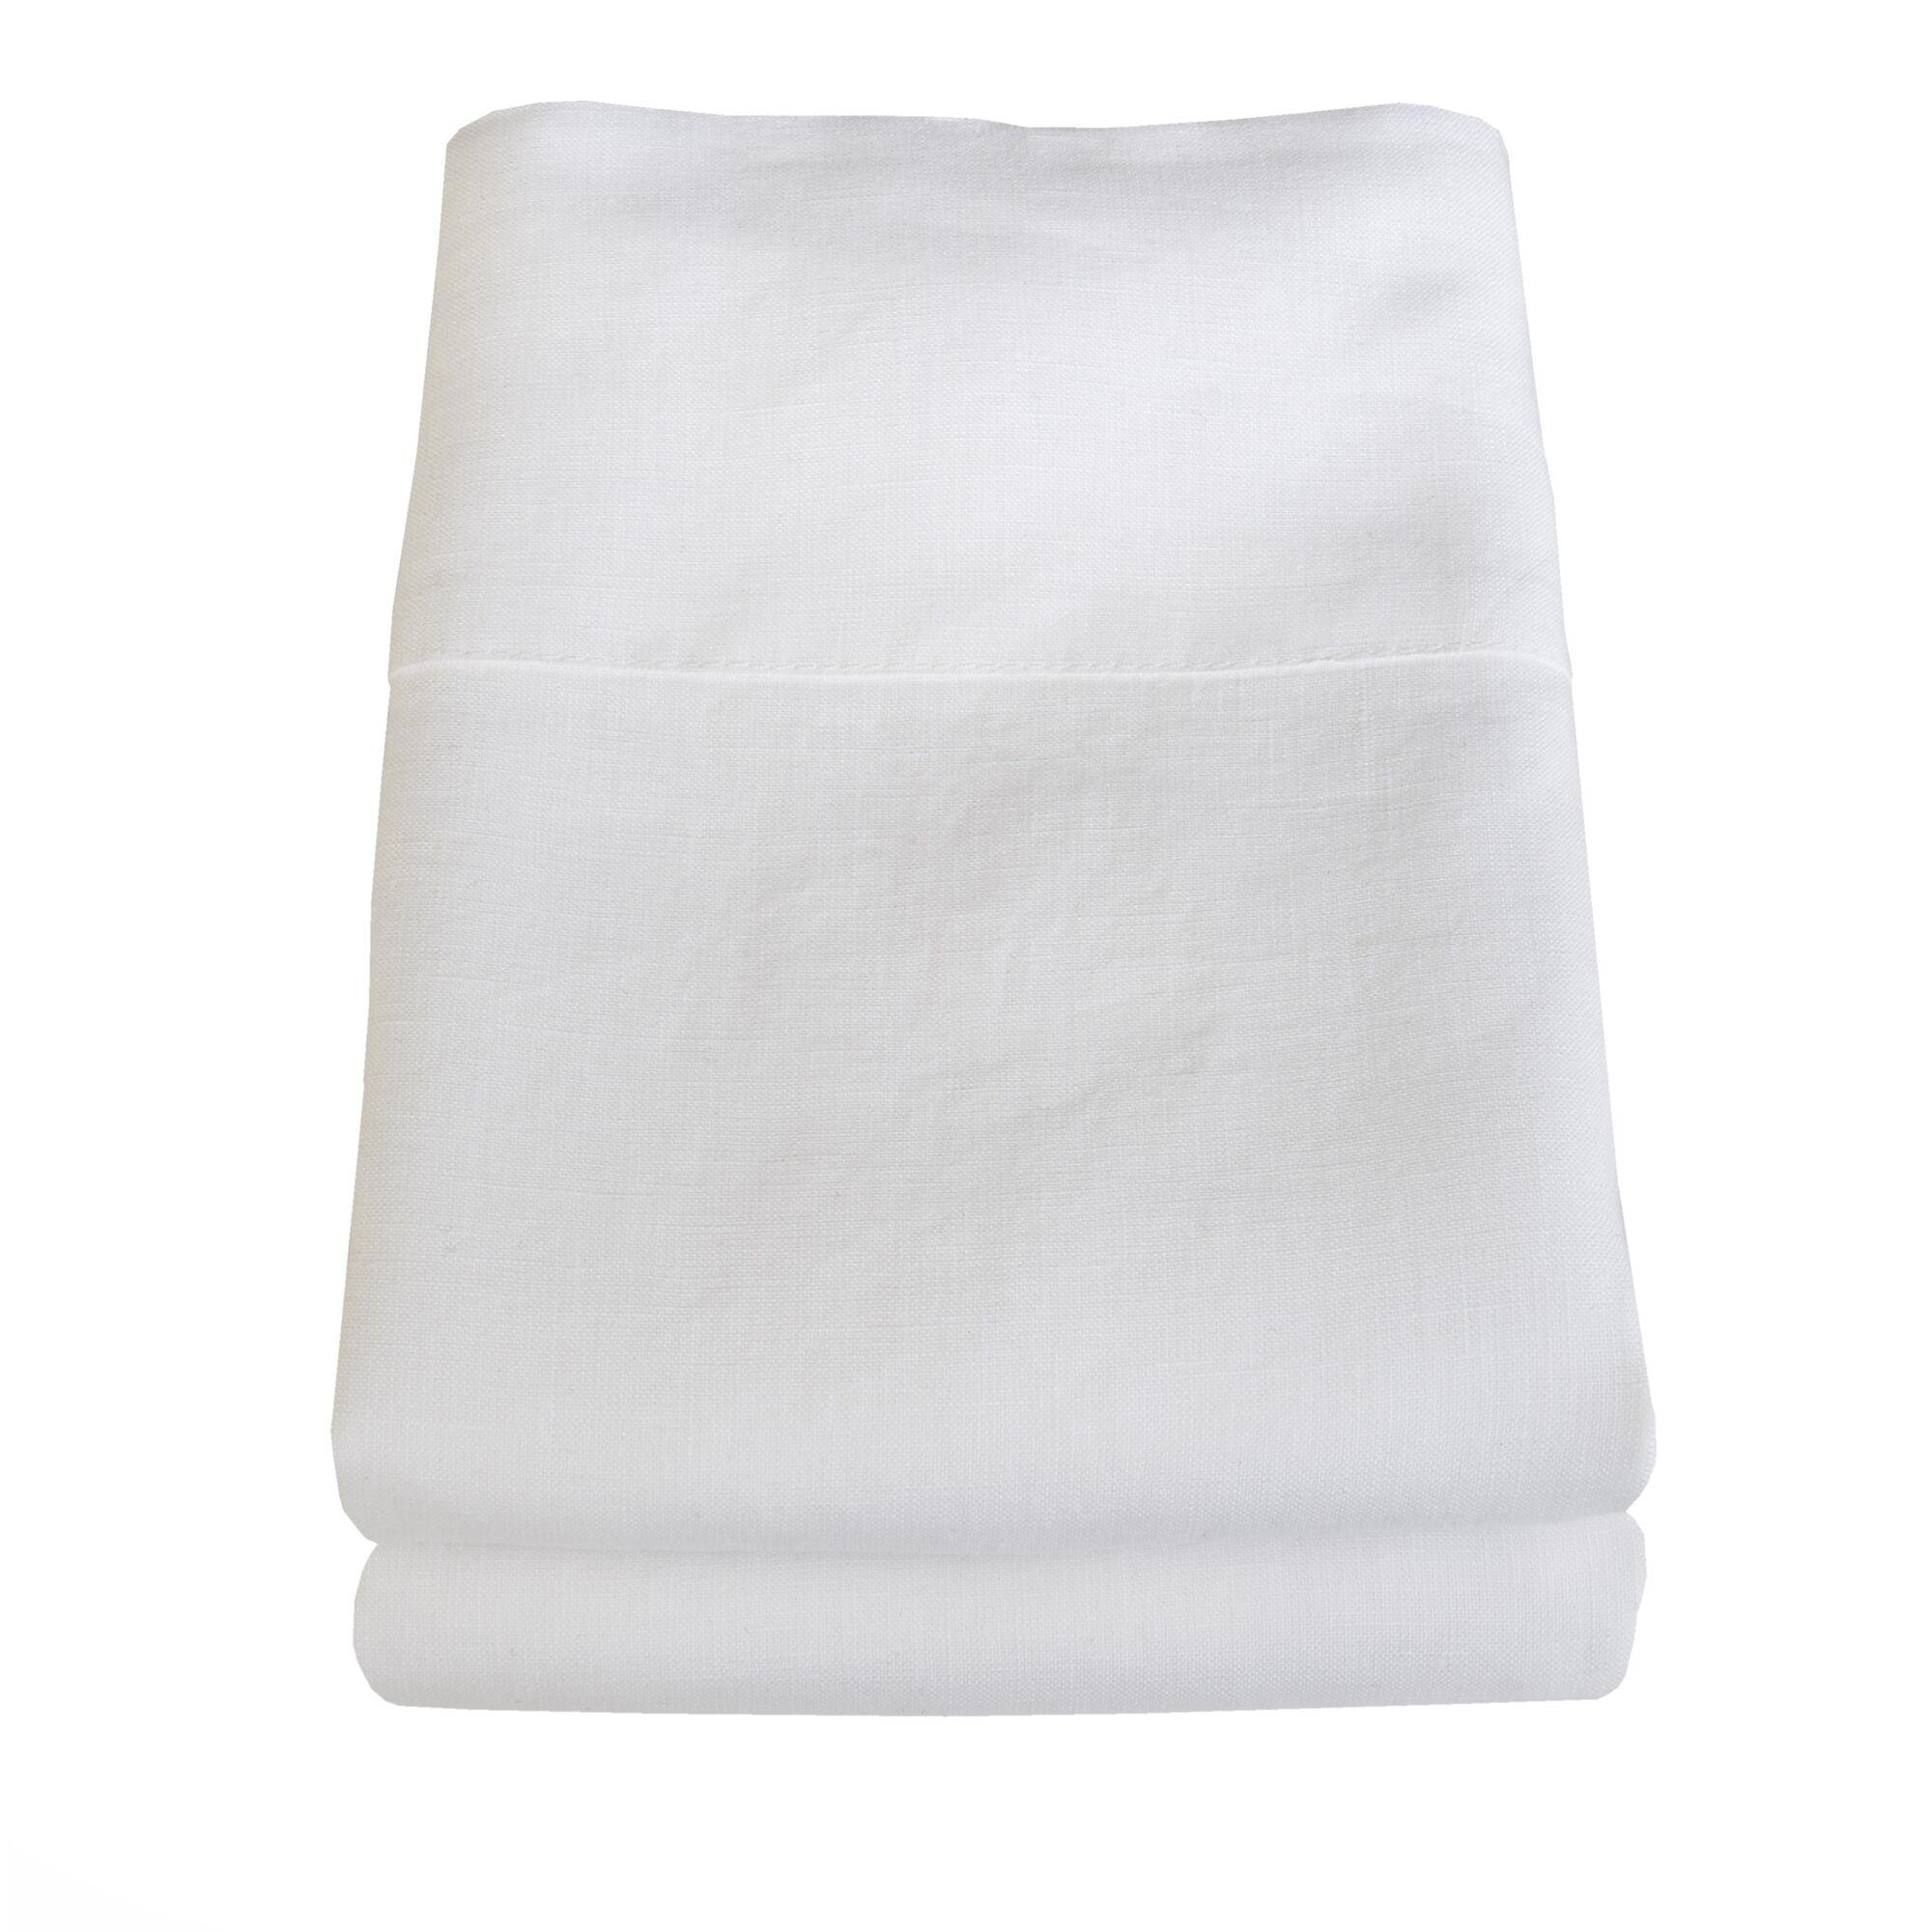 Belgian Eco-Linen Pillowcase Set Size: Standard/Queen, Color: Optic White